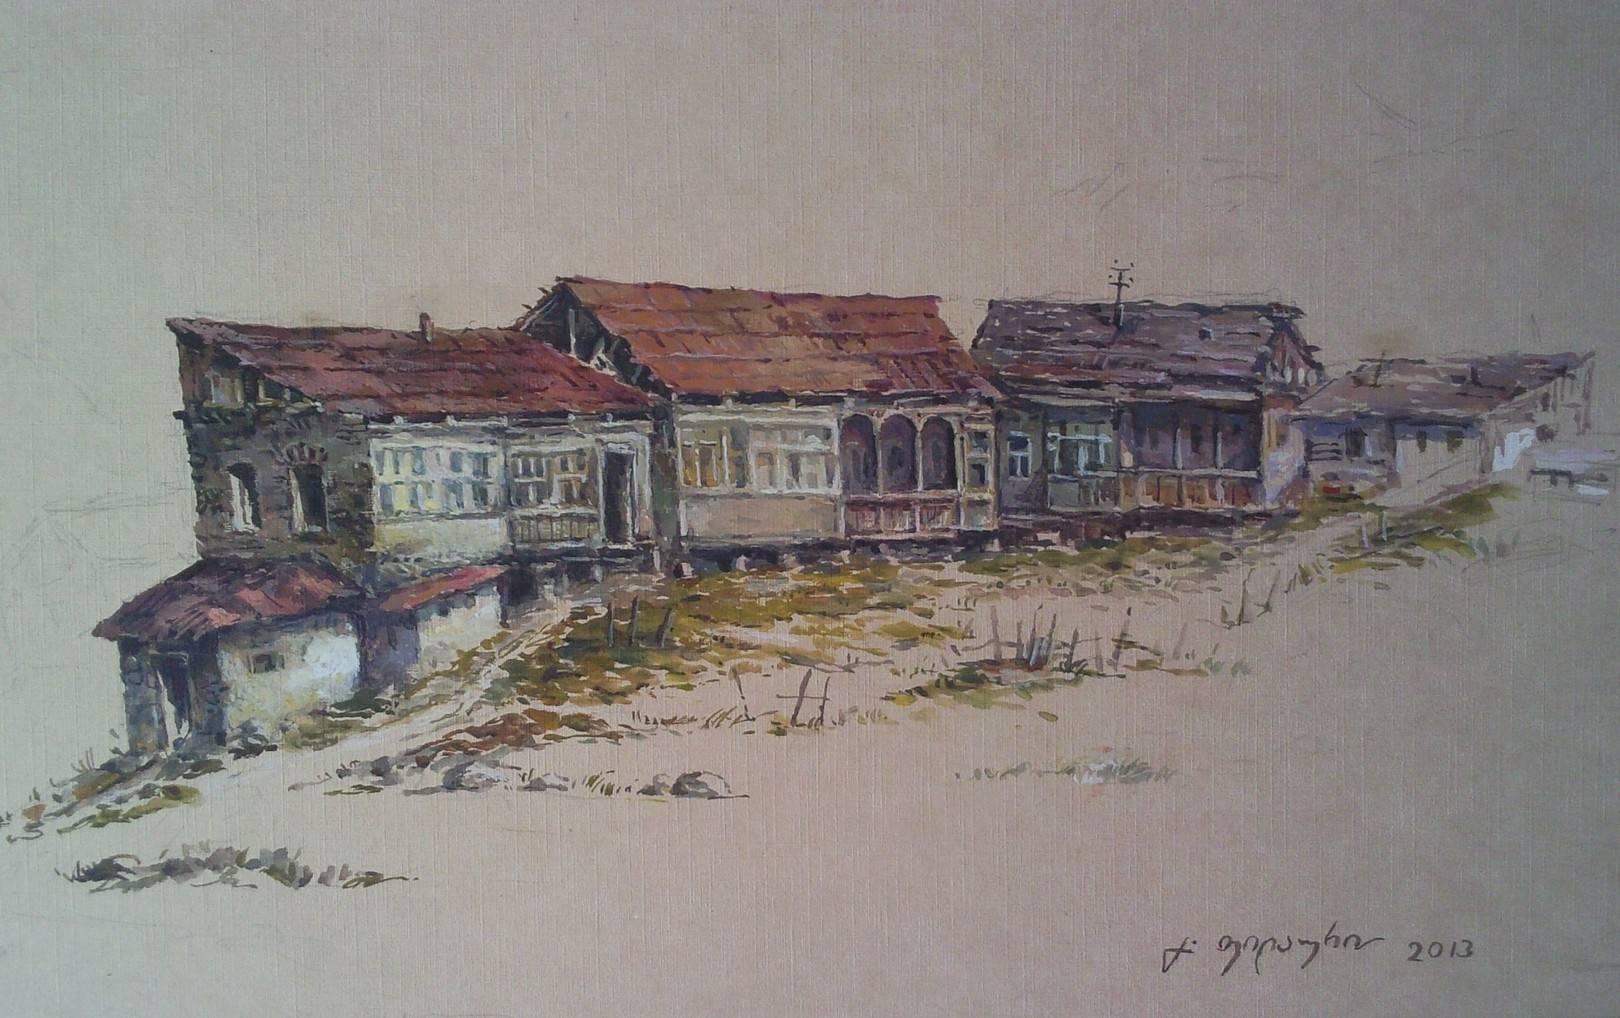 «Дома в Уплисцихе»           бумага, акварель, гуашь «Houses in the Uplistsikhe»  paper, aquarelle, gouache 14x20, 2013